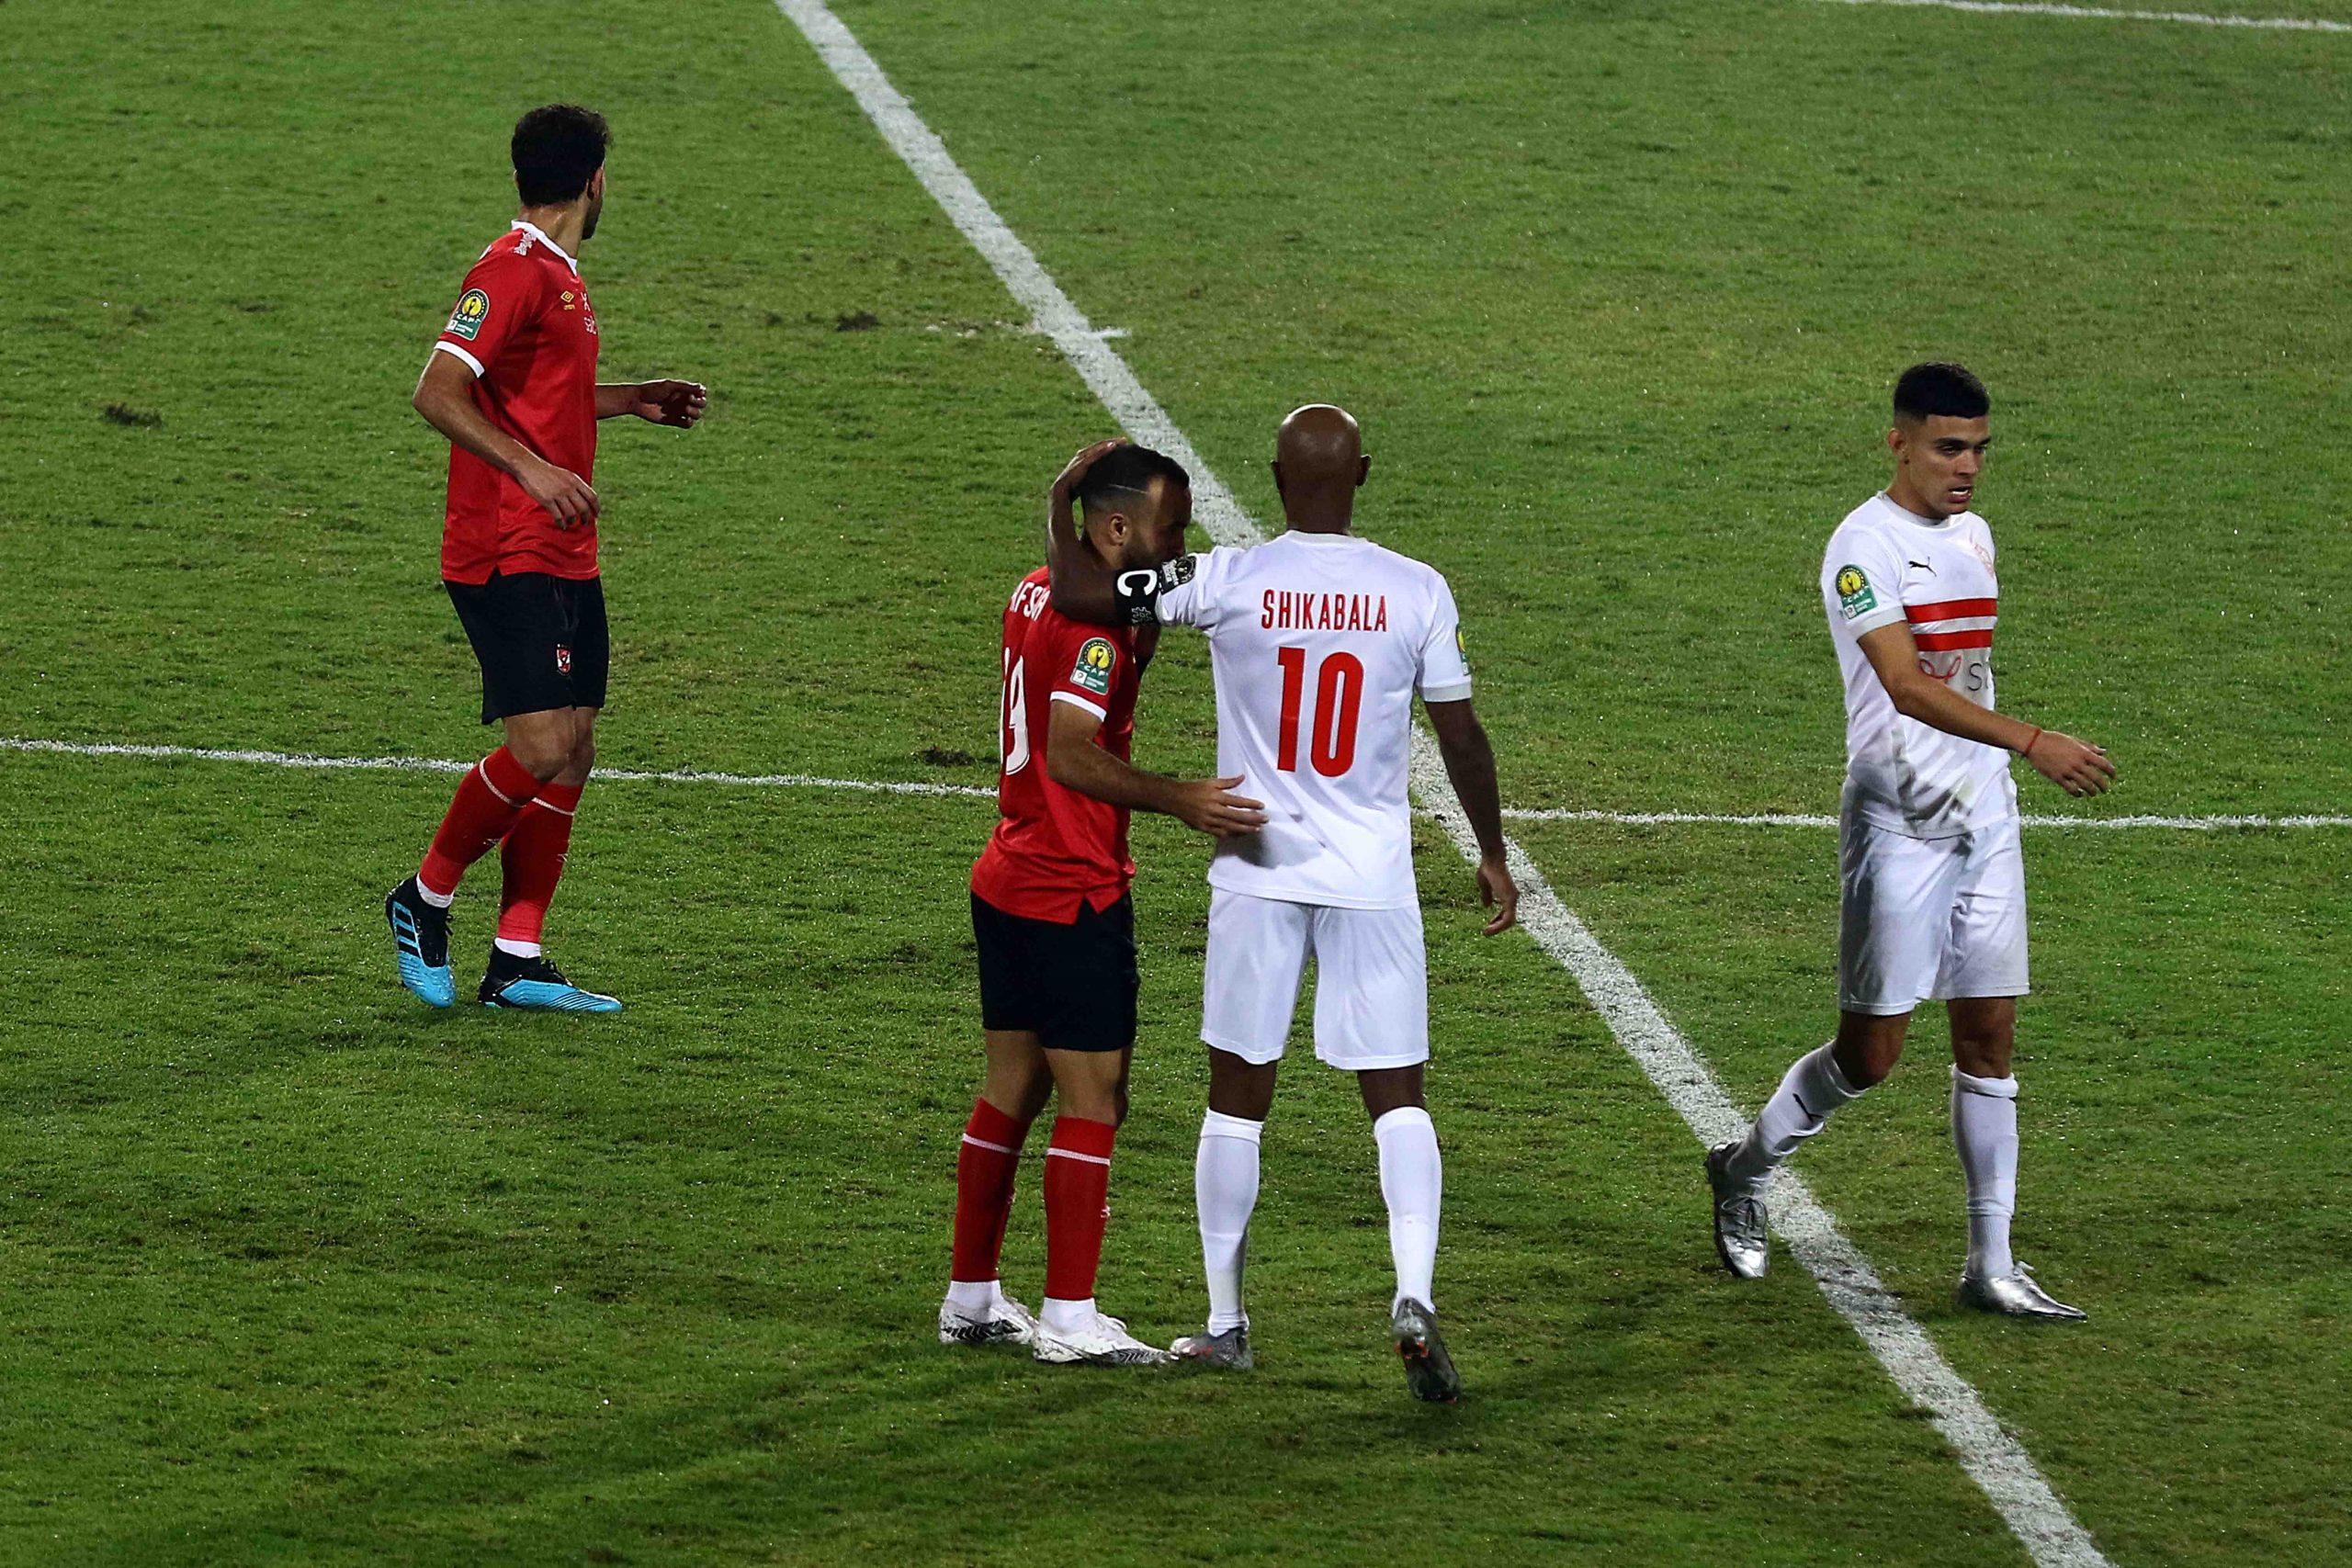 Al Ahly fans arrested over alleged racist gesture at Zamalek's Shikabala - KingFut